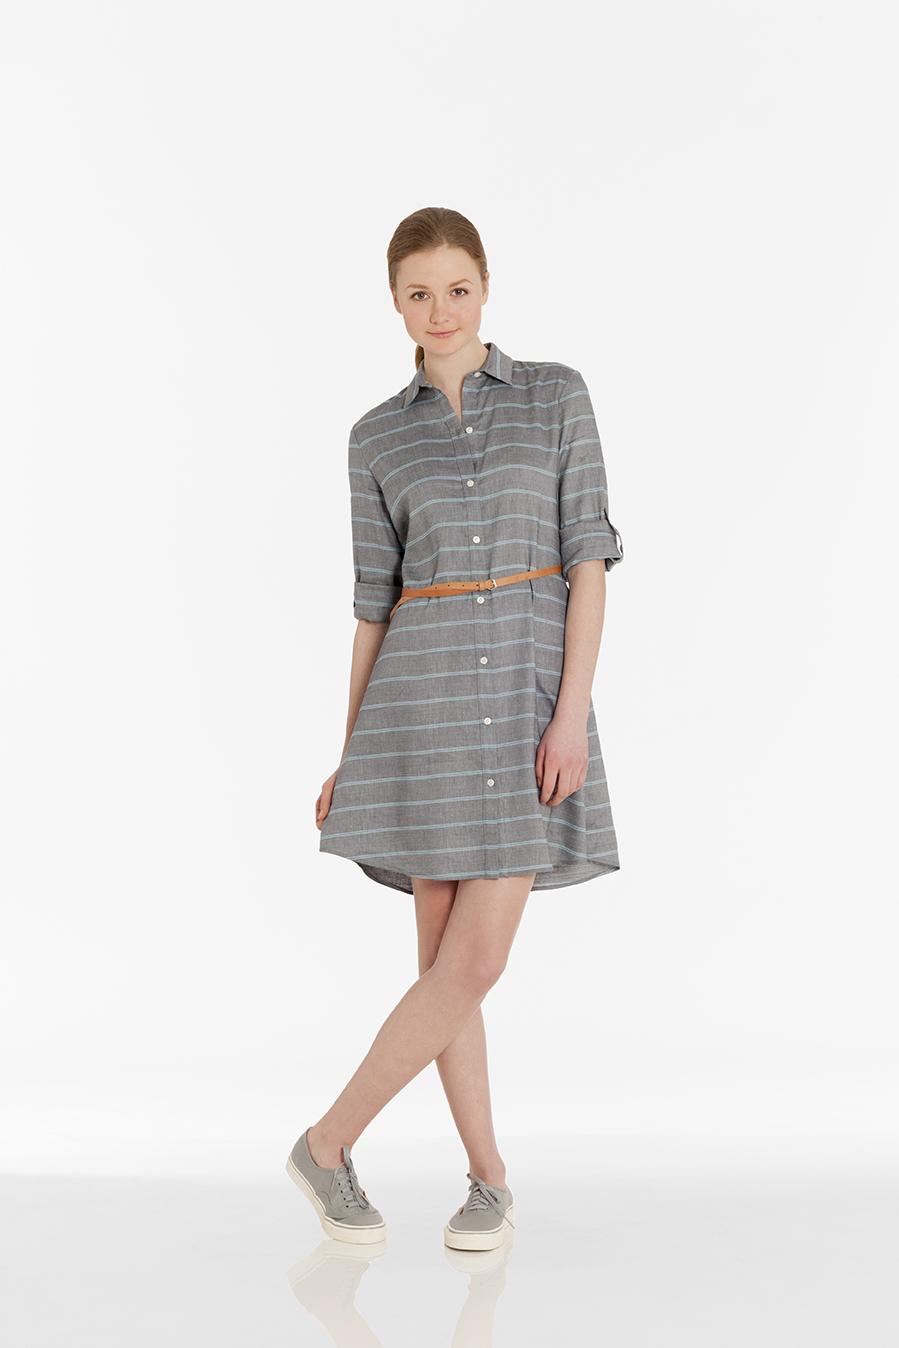 DRESS / 759 BELT / 1410